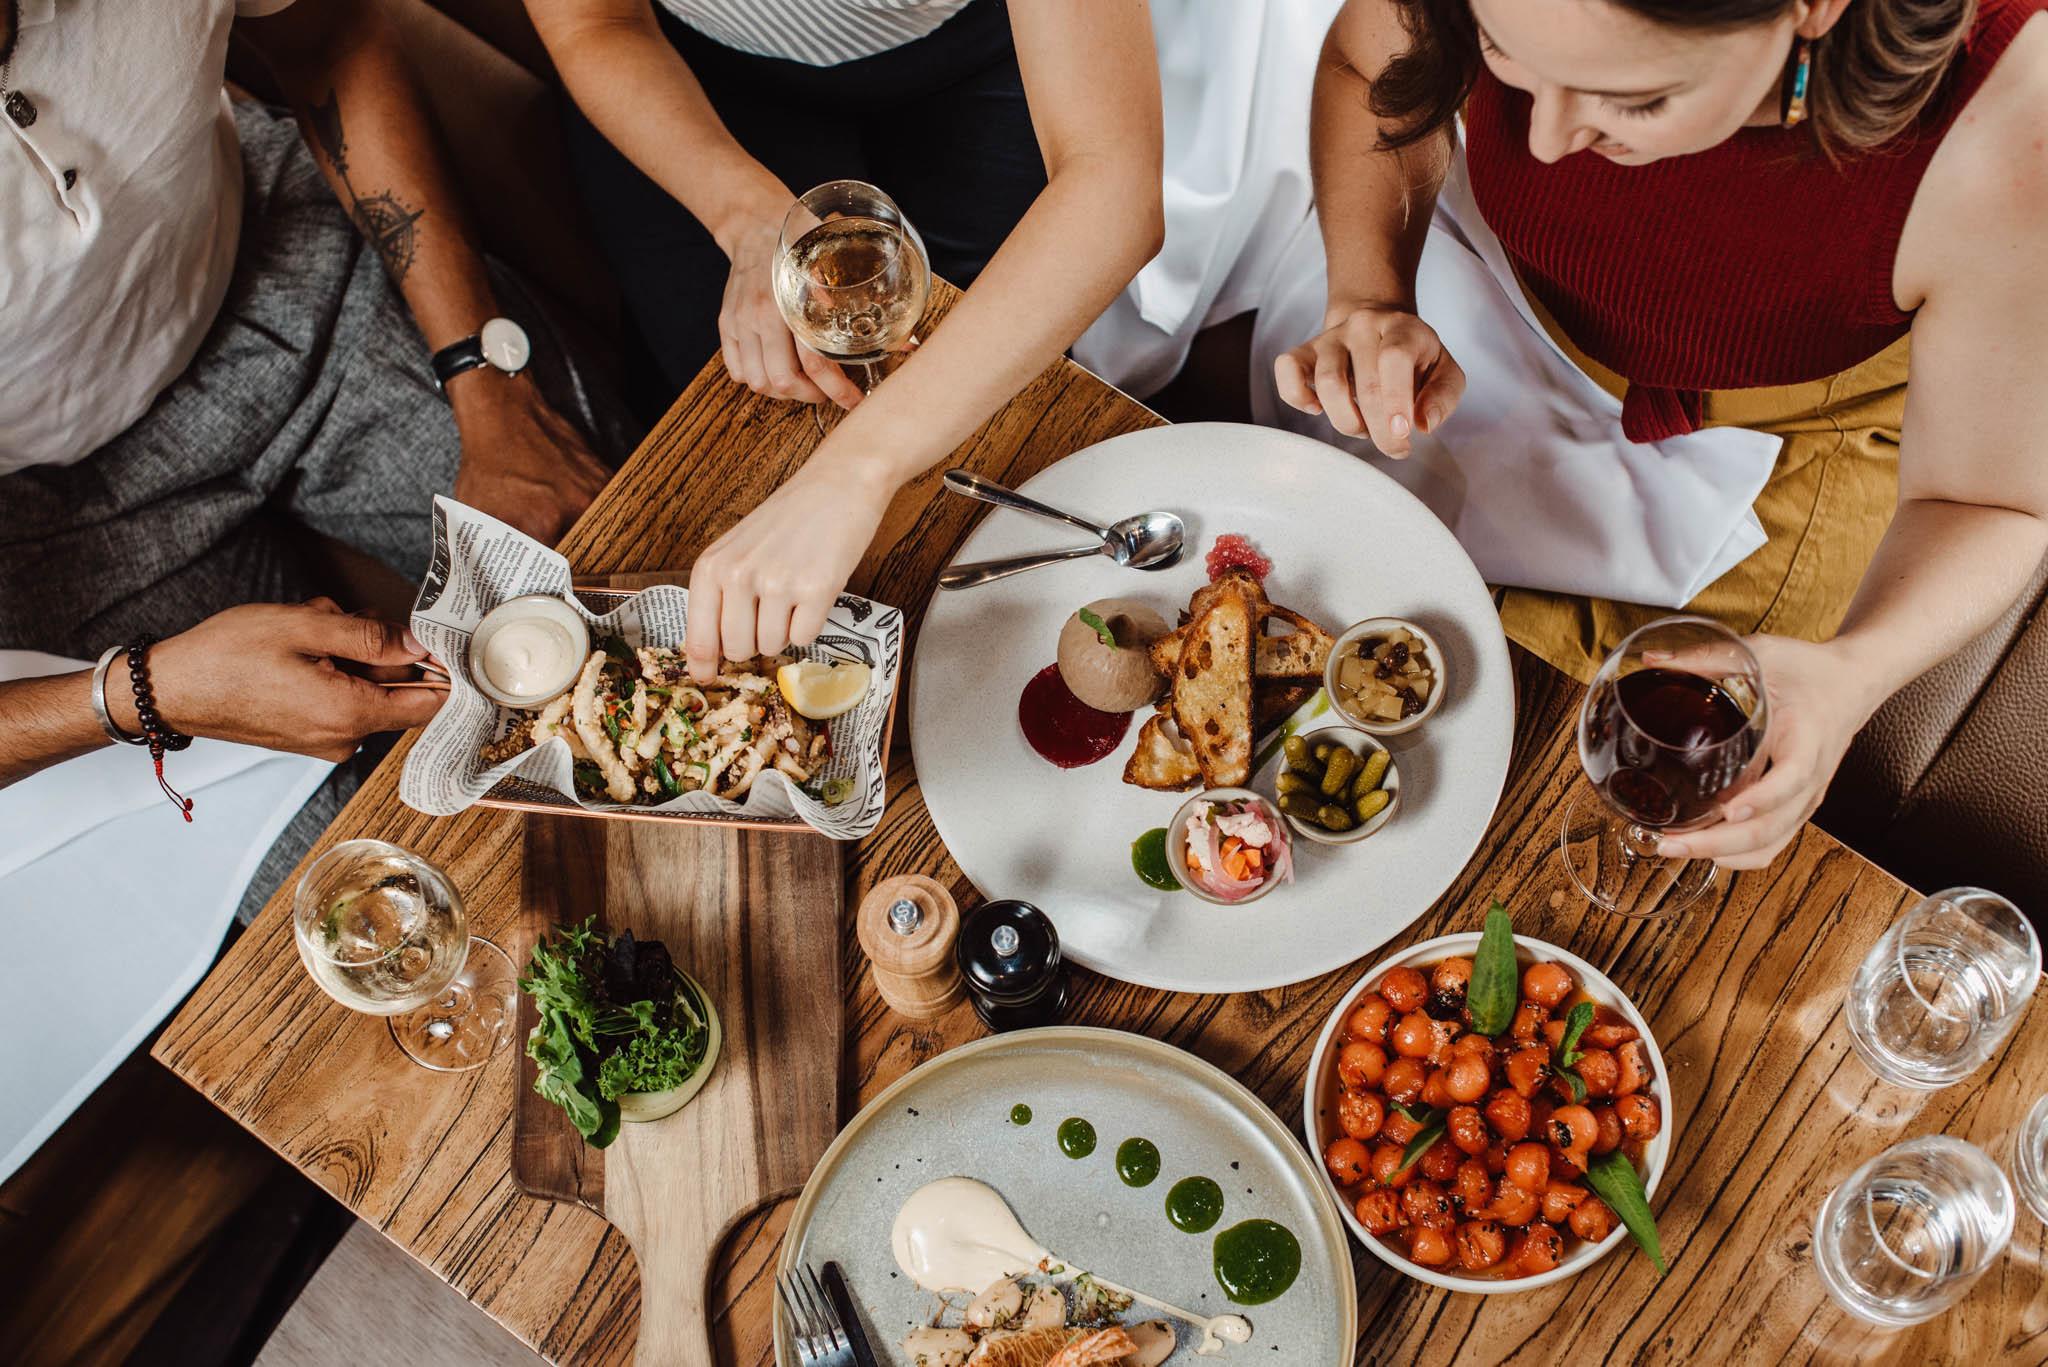 eating food group petrichor meal